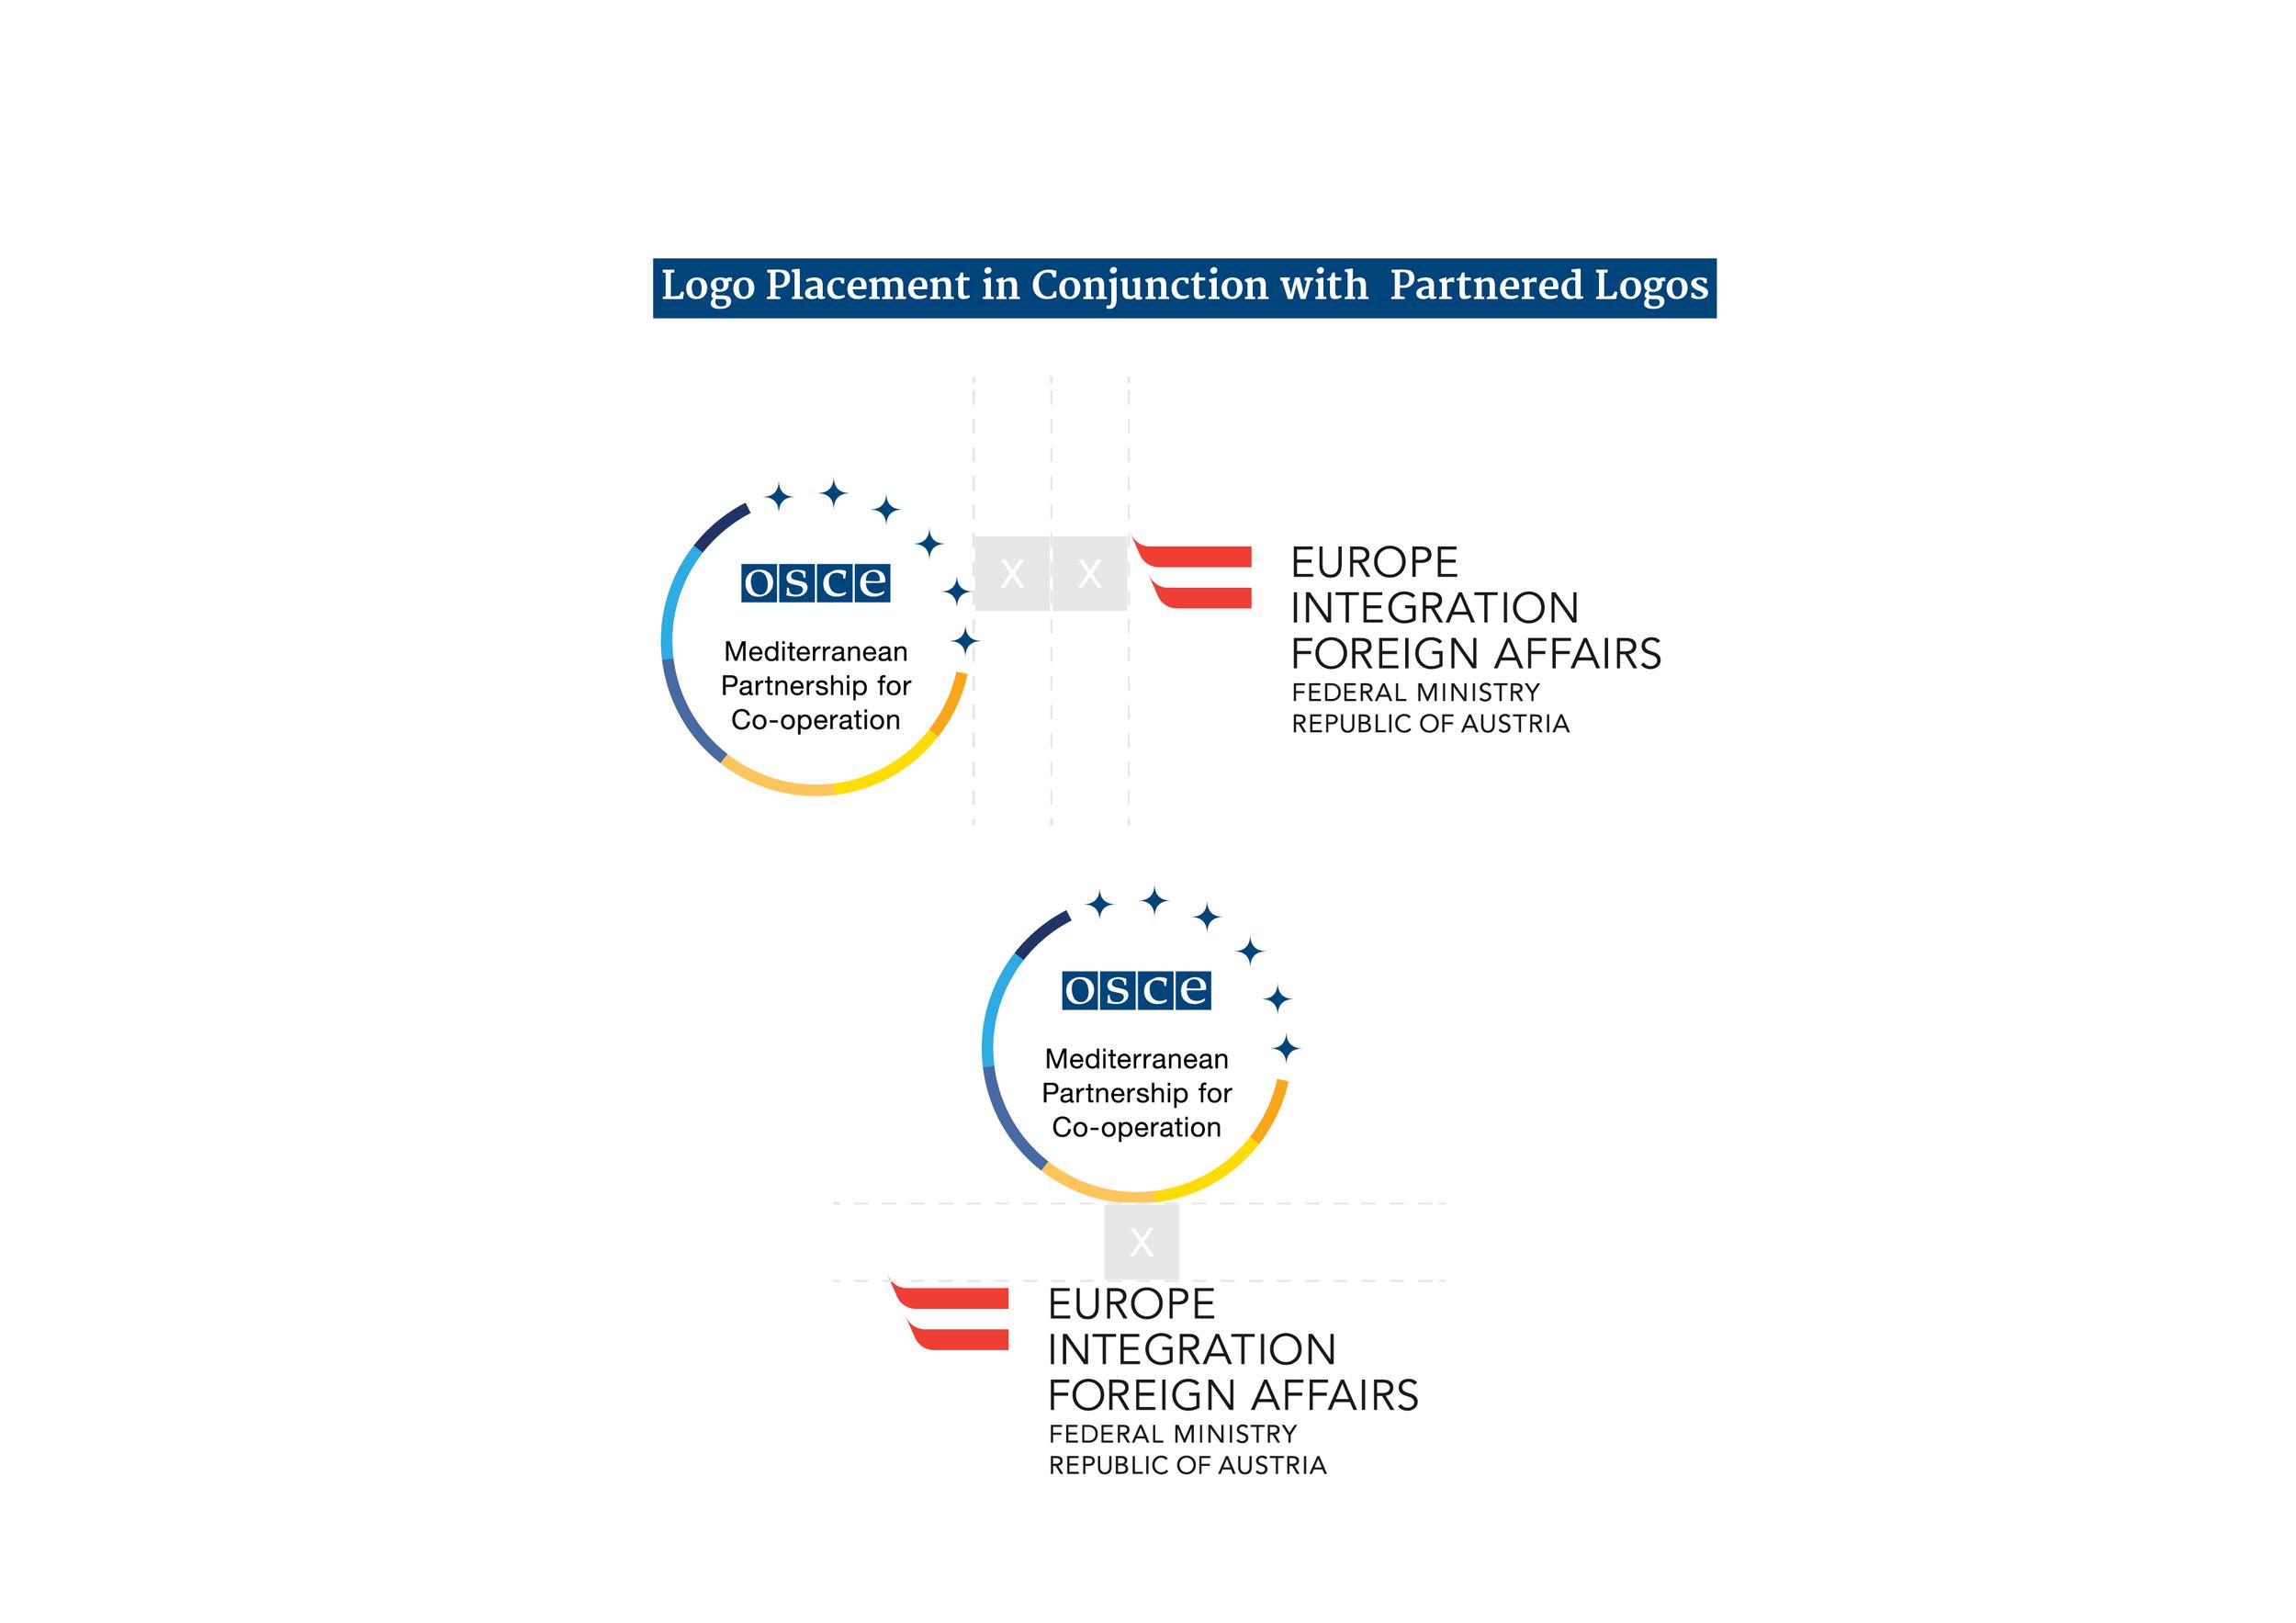 OSCE_Partnership_Logo_Graphic_Charter_31101613.png